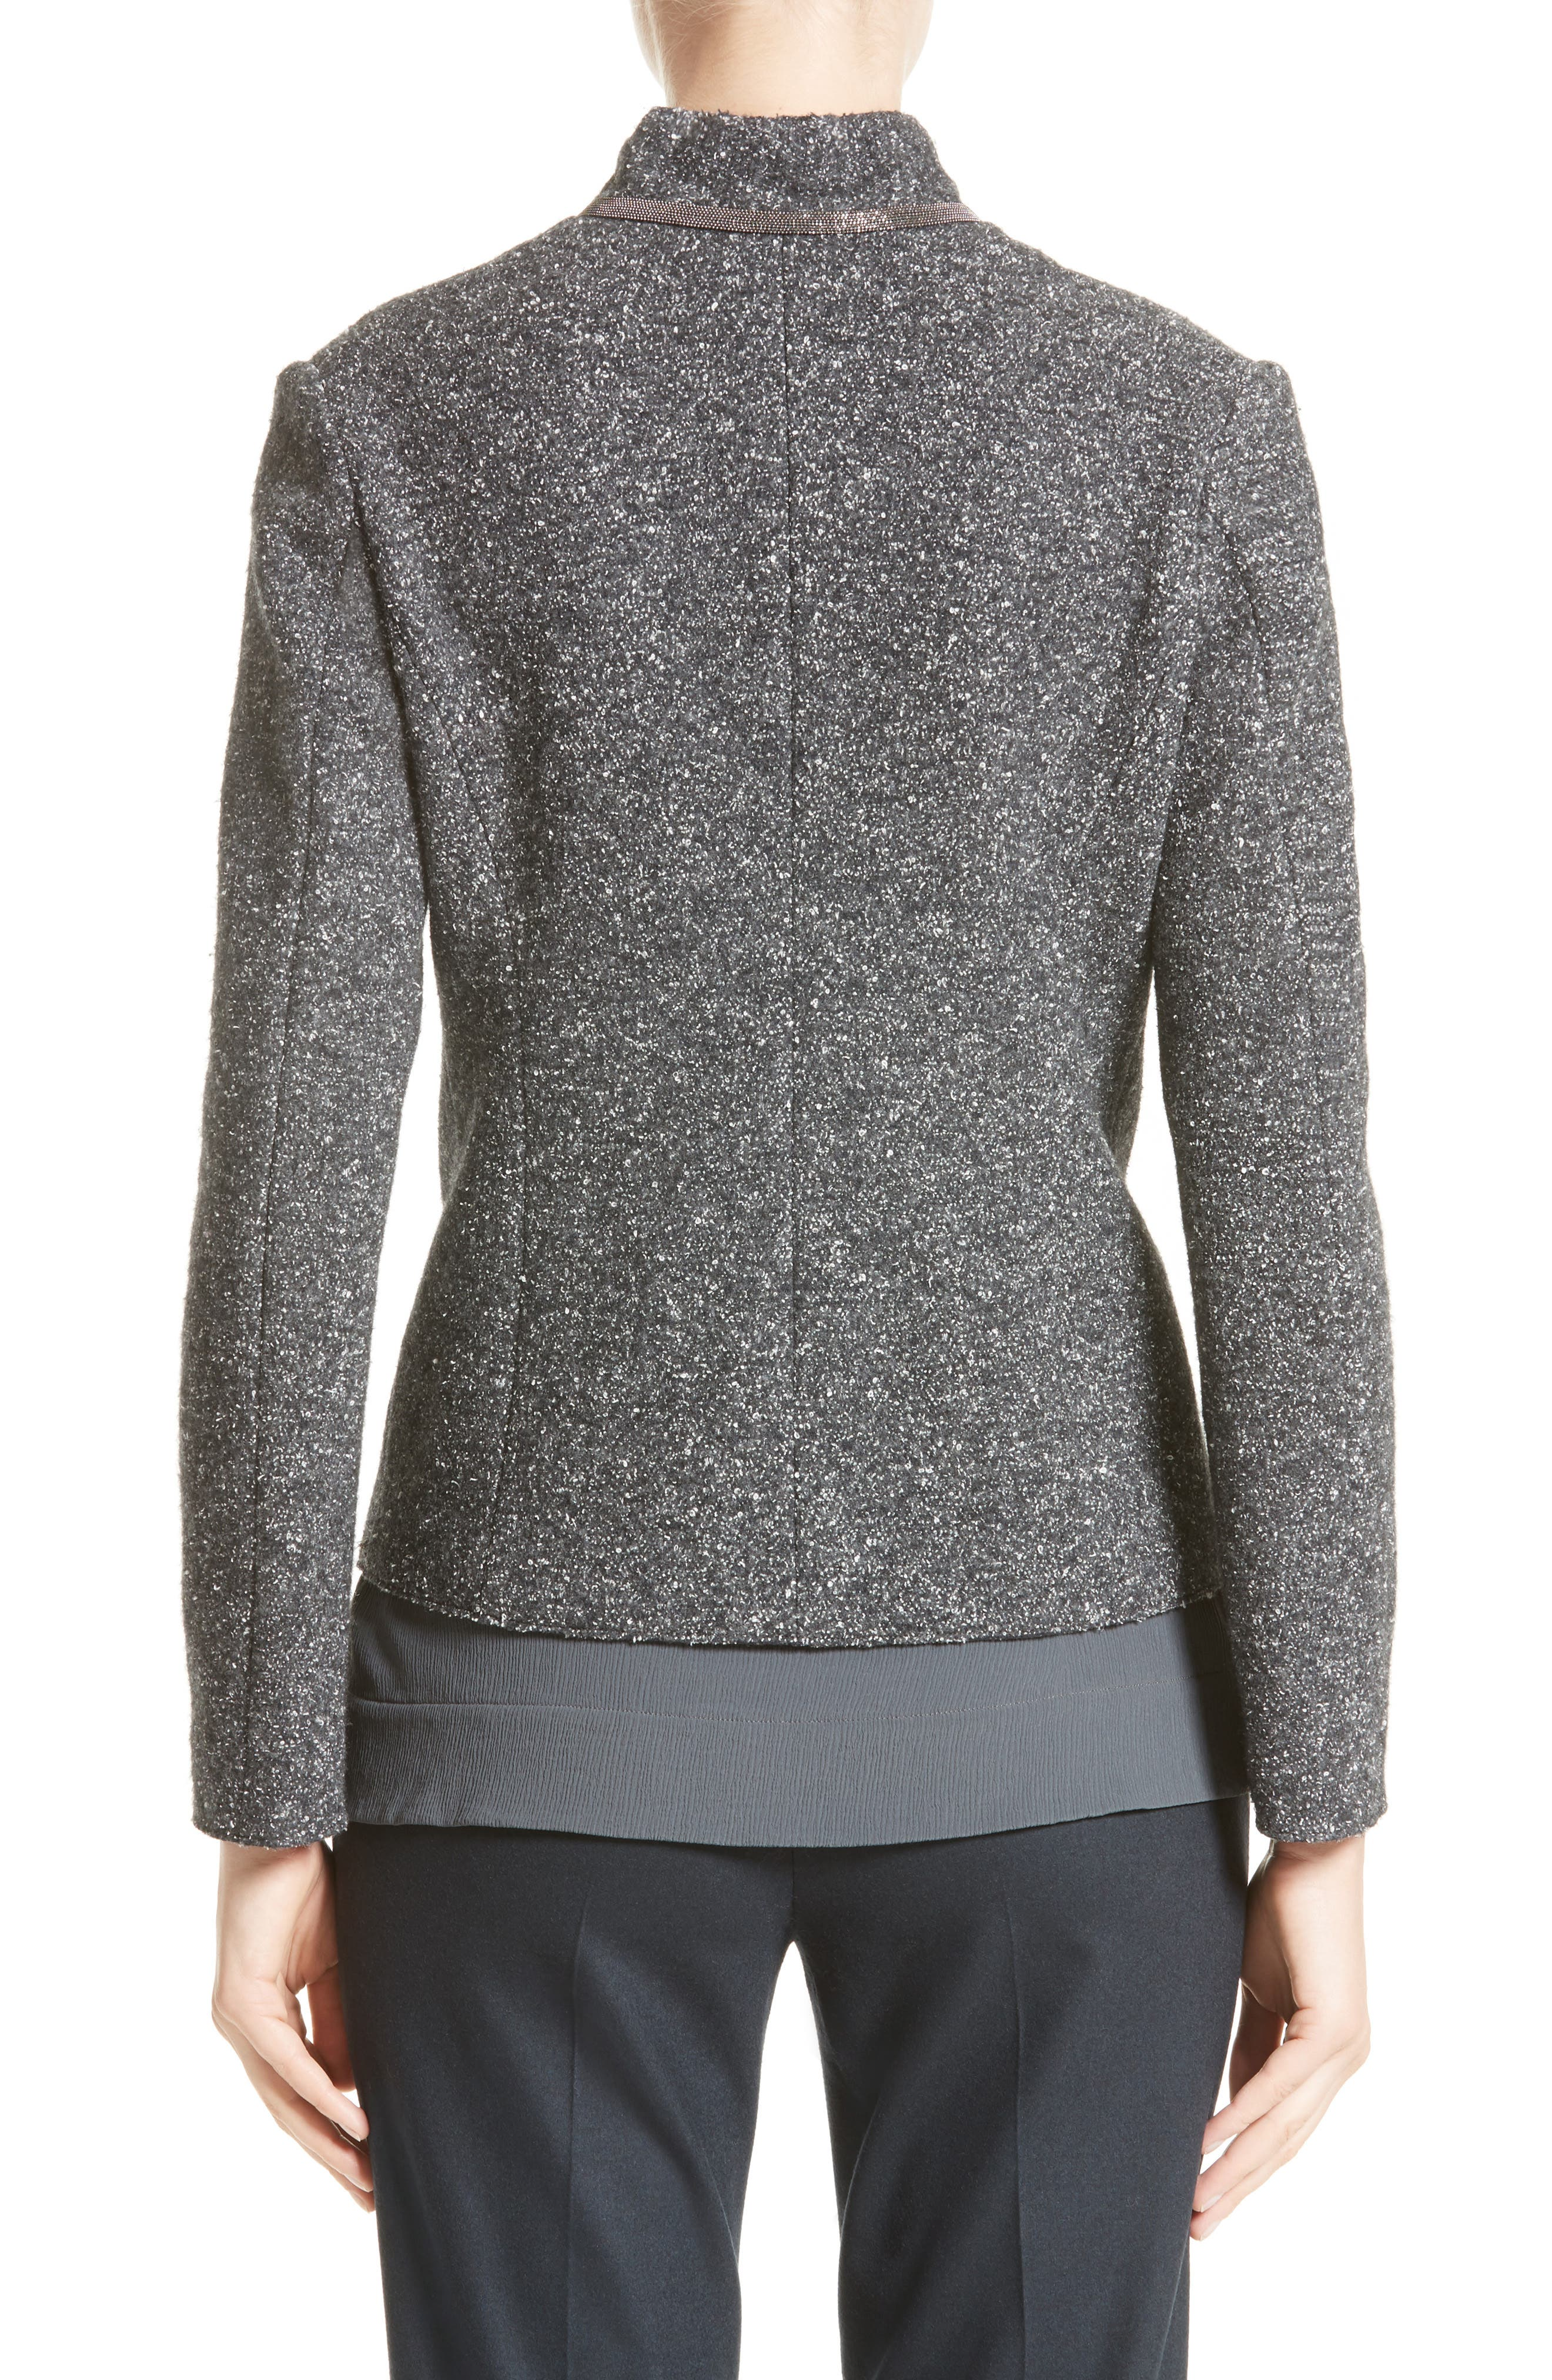 Pebble Tweed Knit Jacket,                             Alternate thumbnail 3, color,